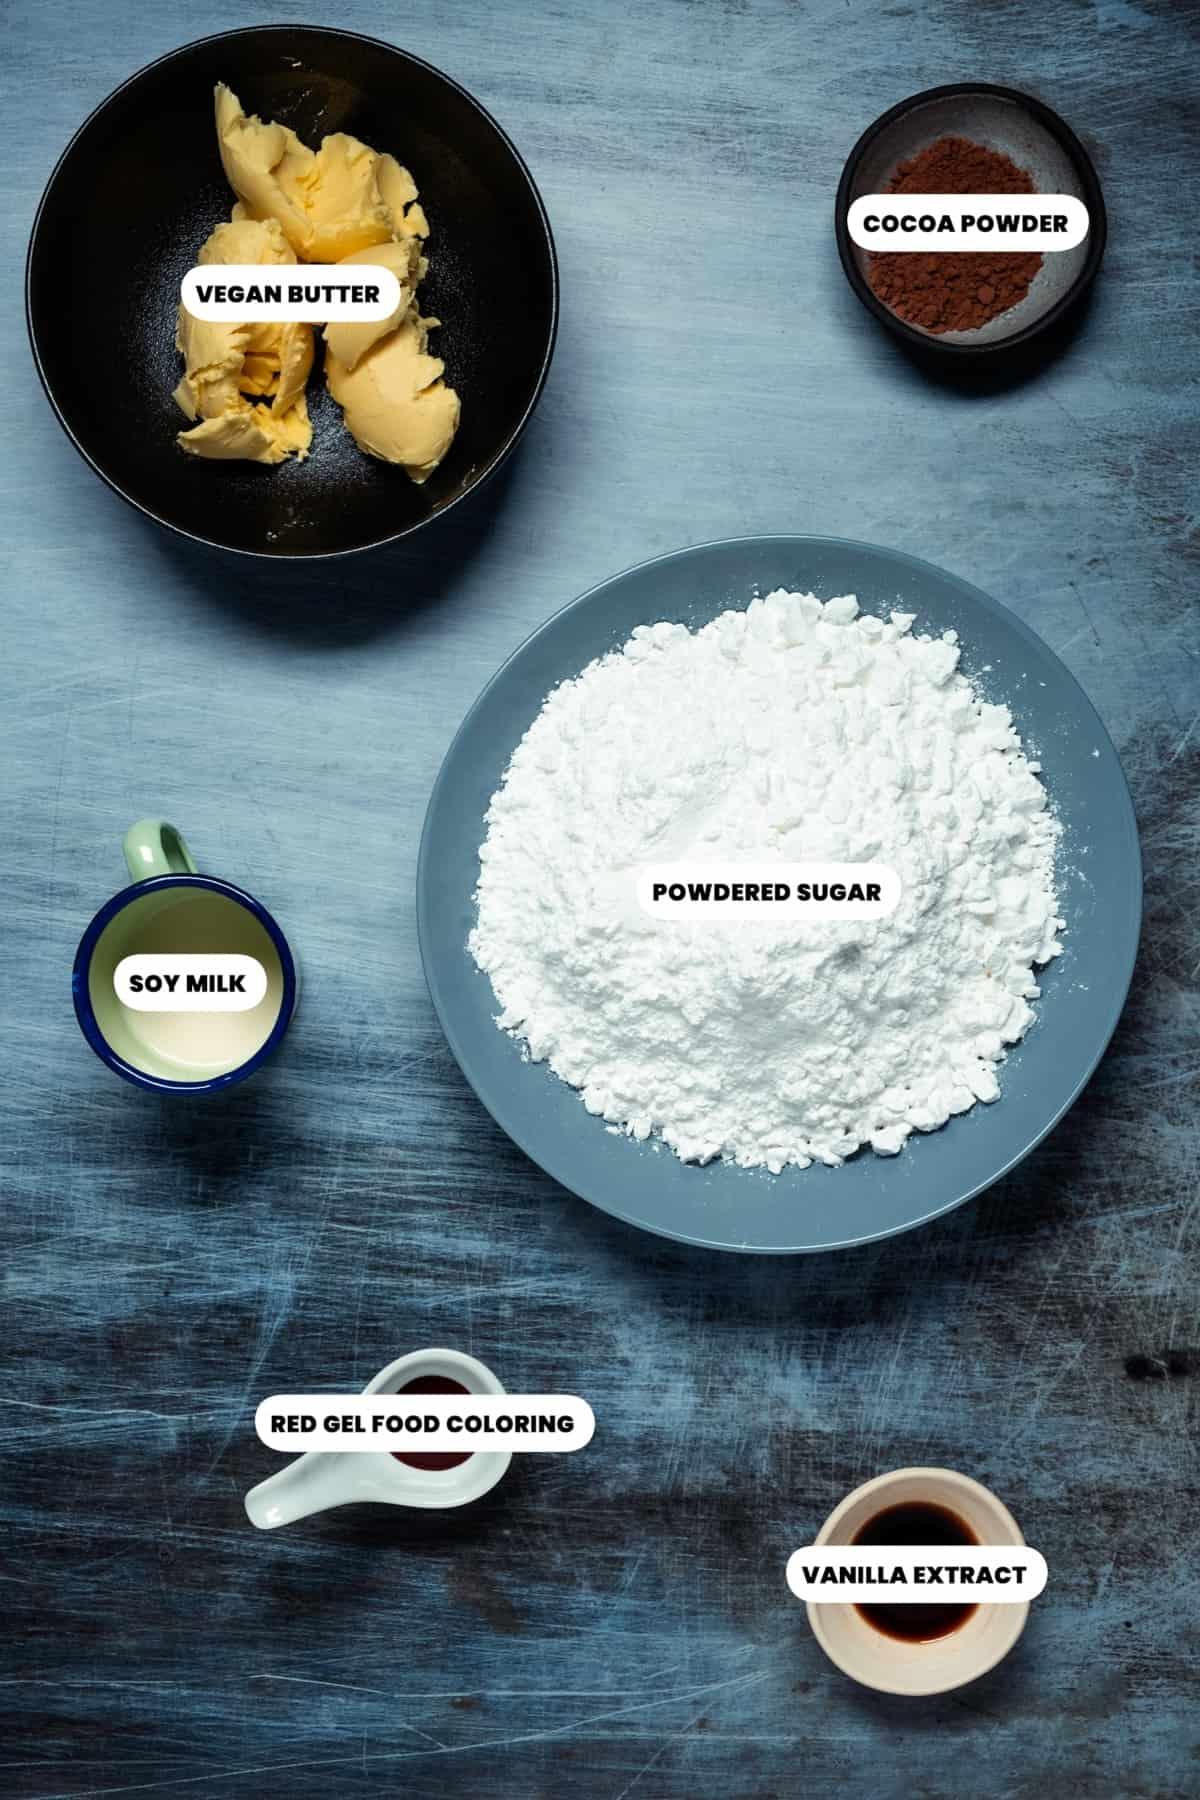 Photo of the ingredients to make vegan red velvet frosting.